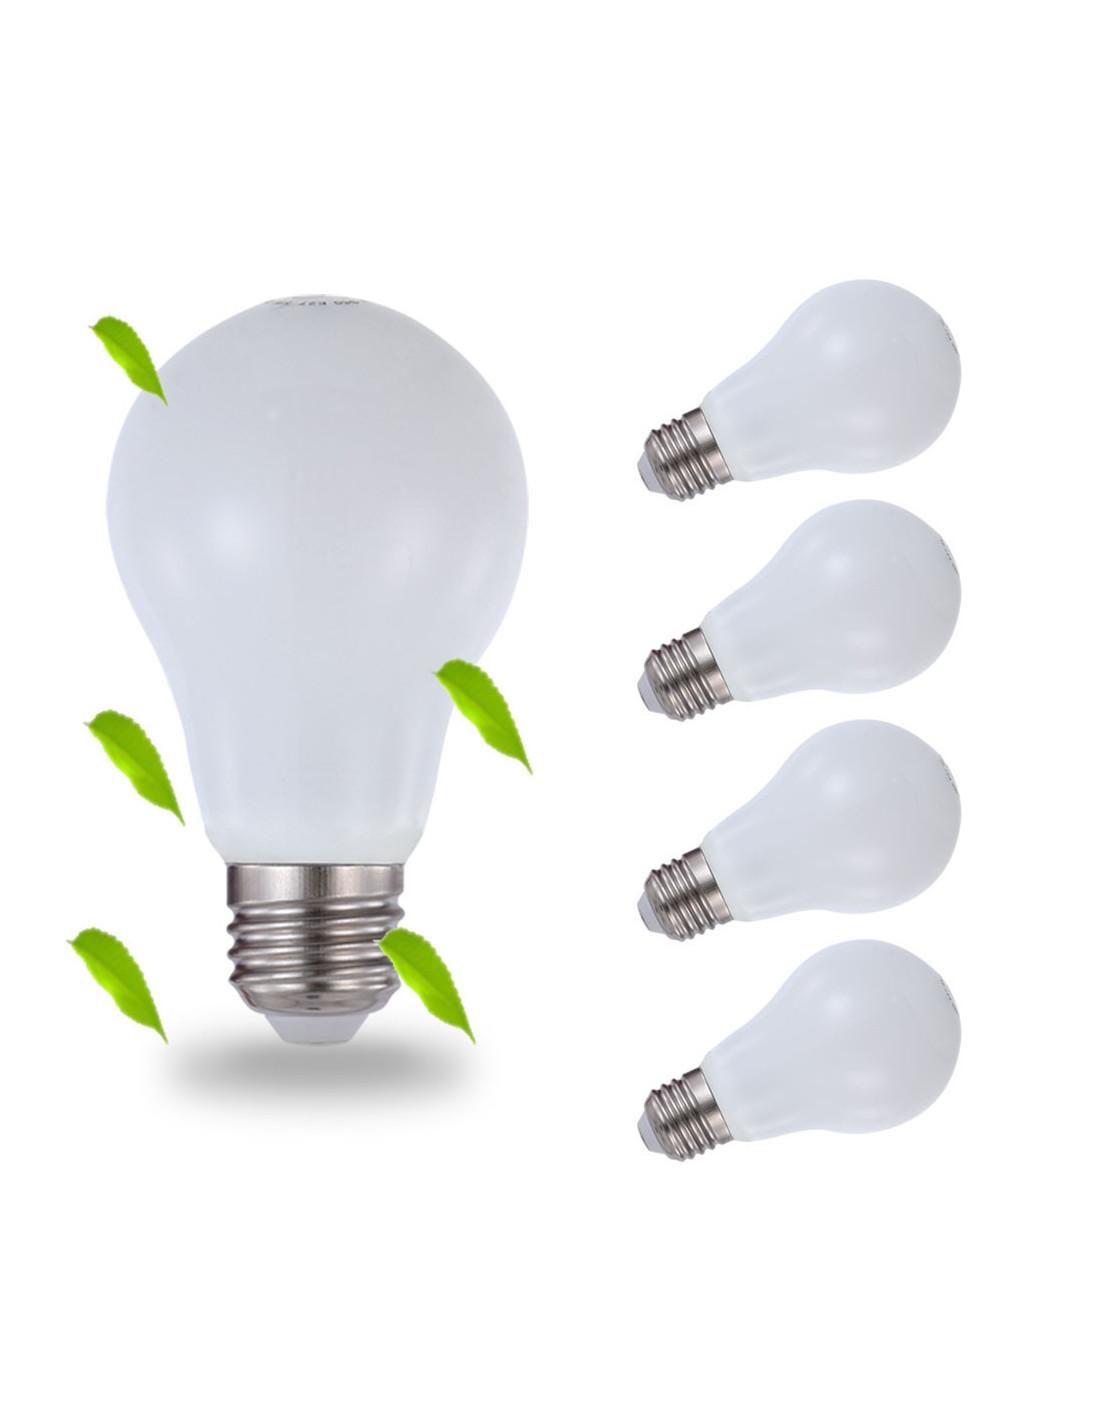 luxbien led gl hbirne 5w ersetz 40 watt e27 5w 400 lumen. Black Bedroom Furniture Sets. Home Design Ideas